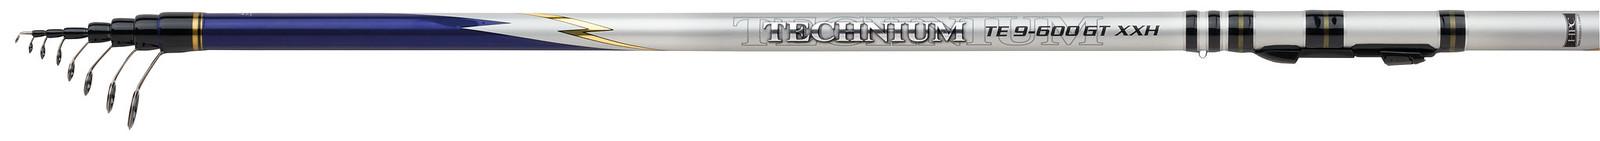 Technium TE GT 9 XXH